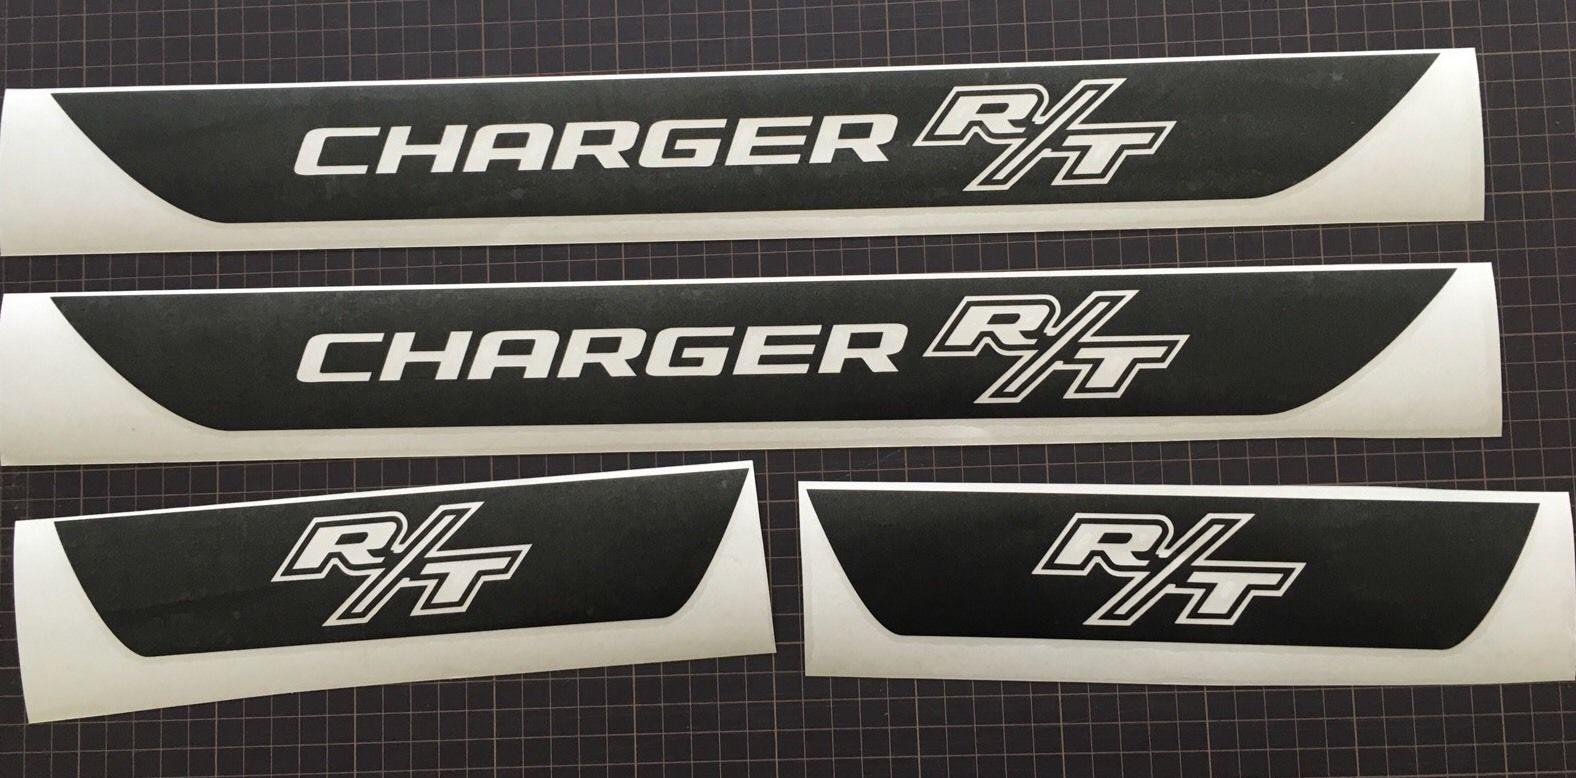 R-T Dodge Charger Vinyl Türschweller Aufkleber 2006 2007 2008 2009 2010